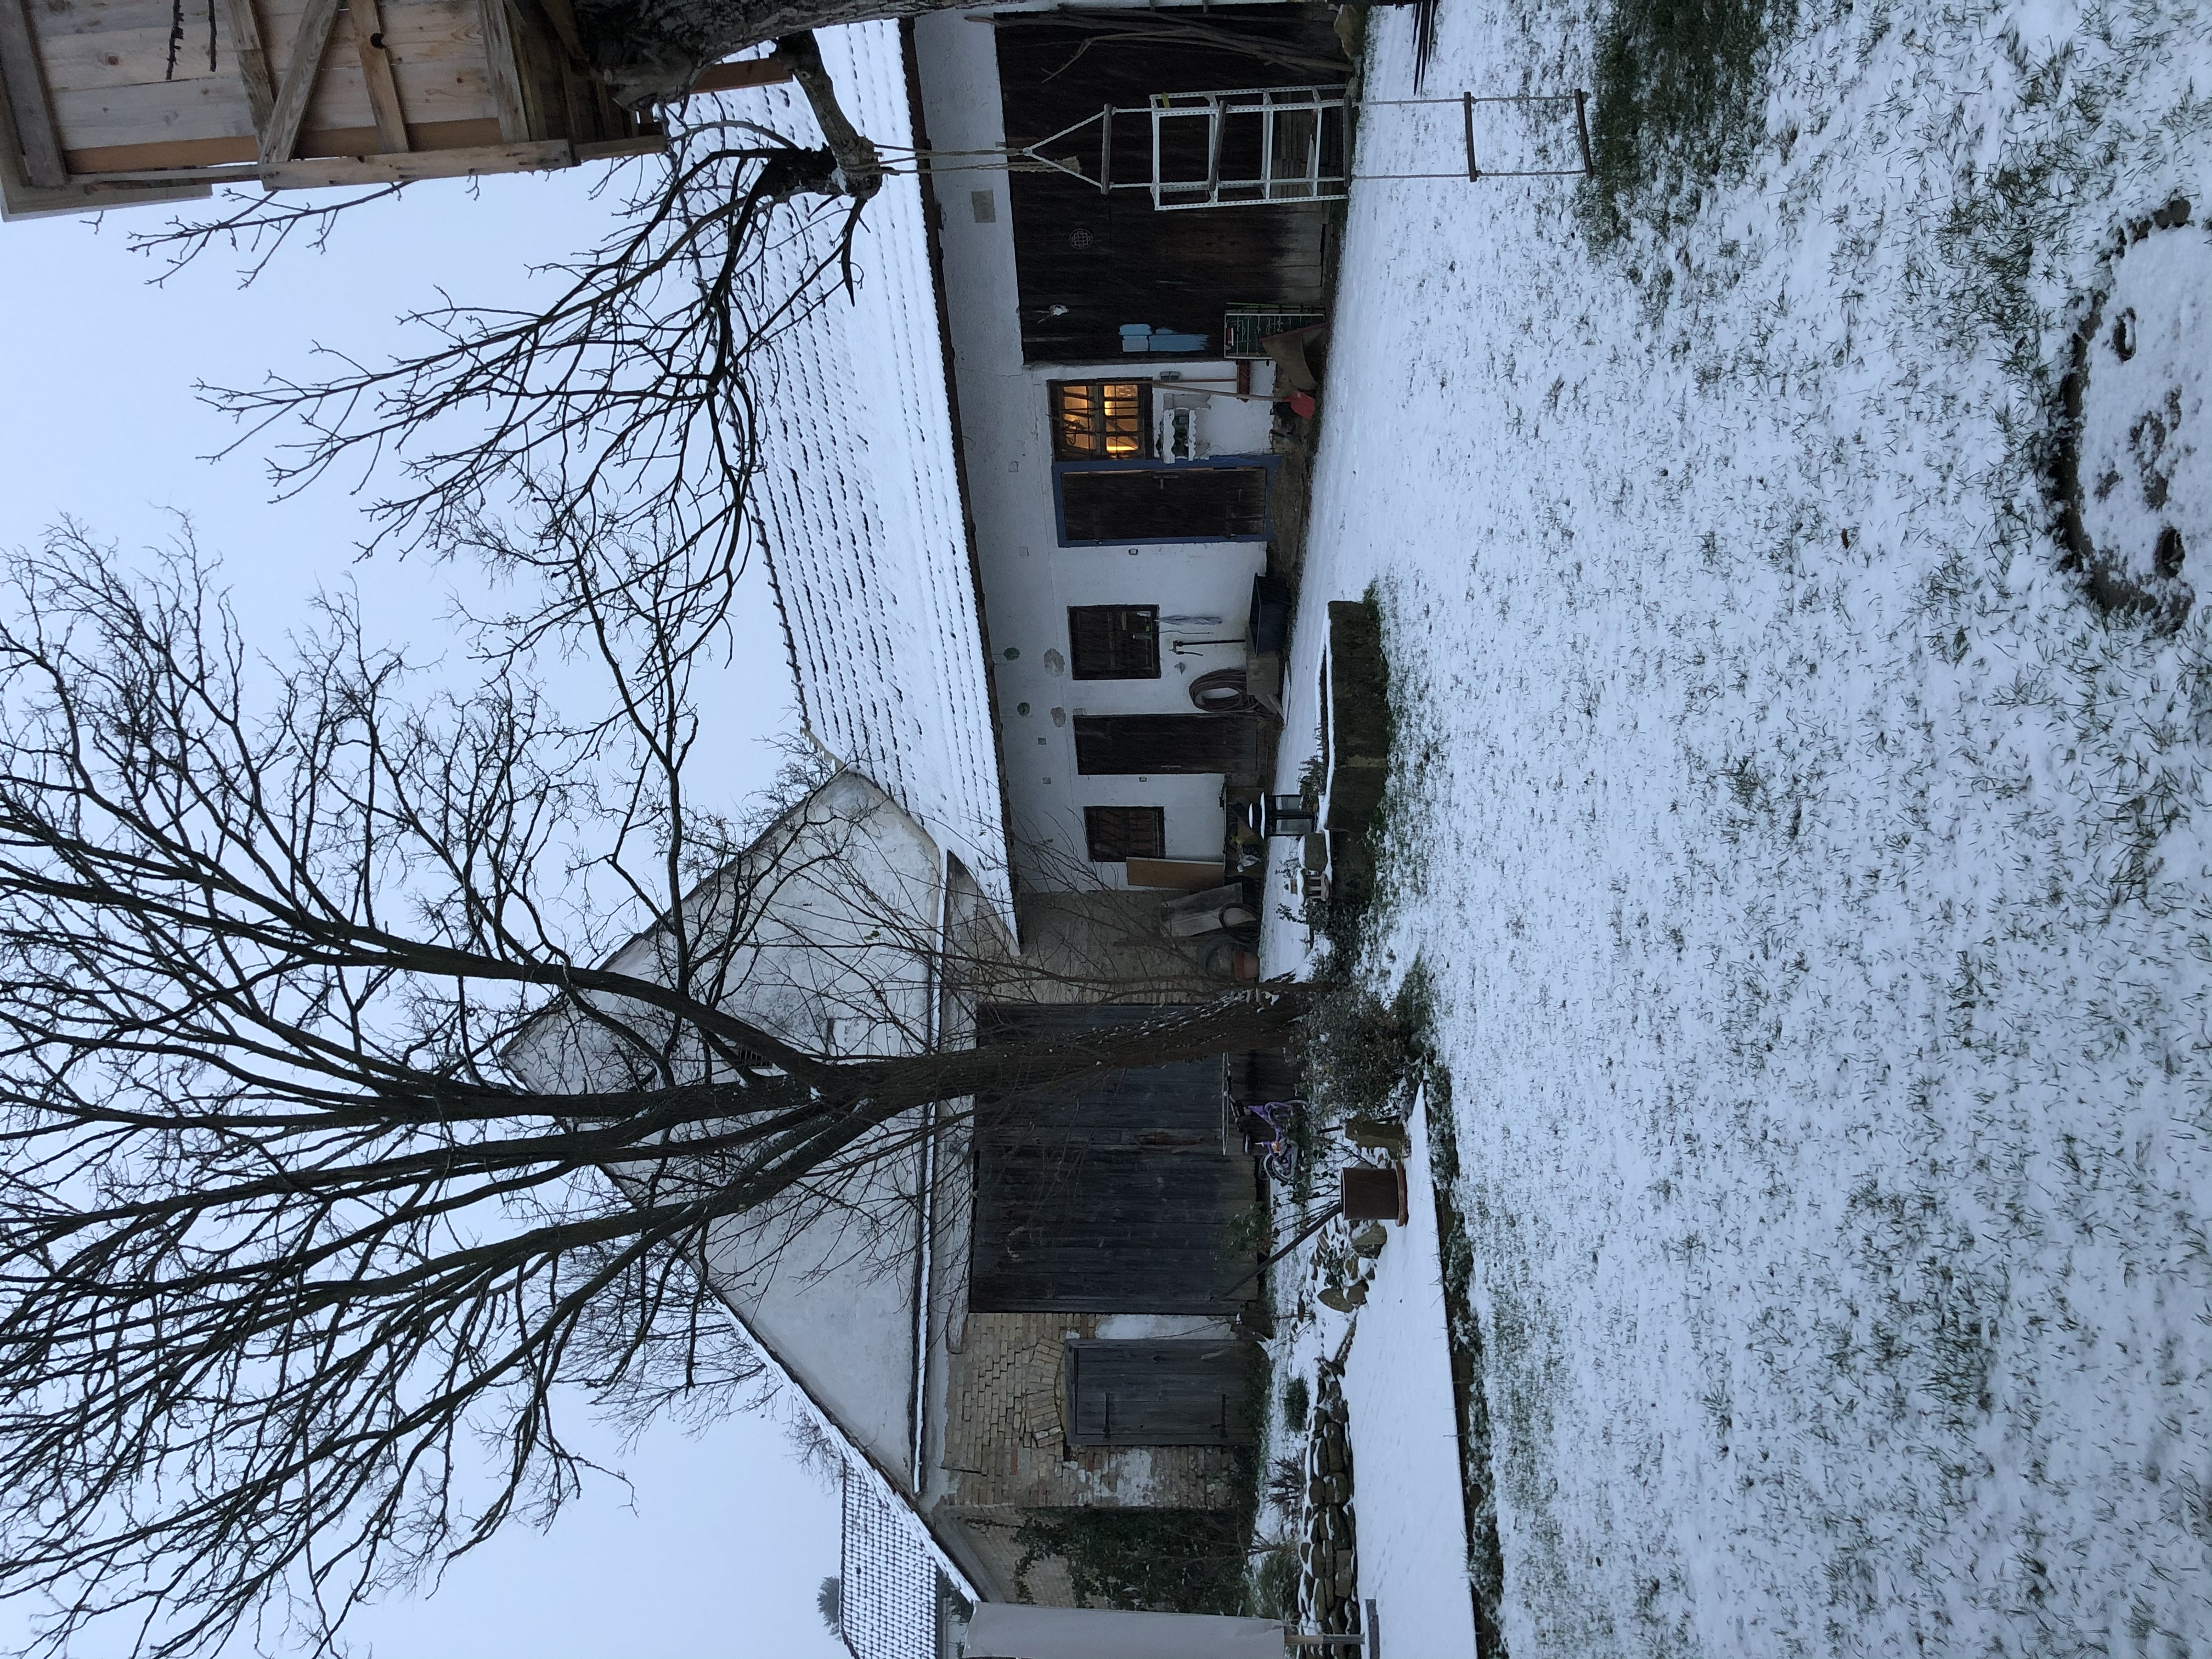 Neudlhof - Winterbeginn